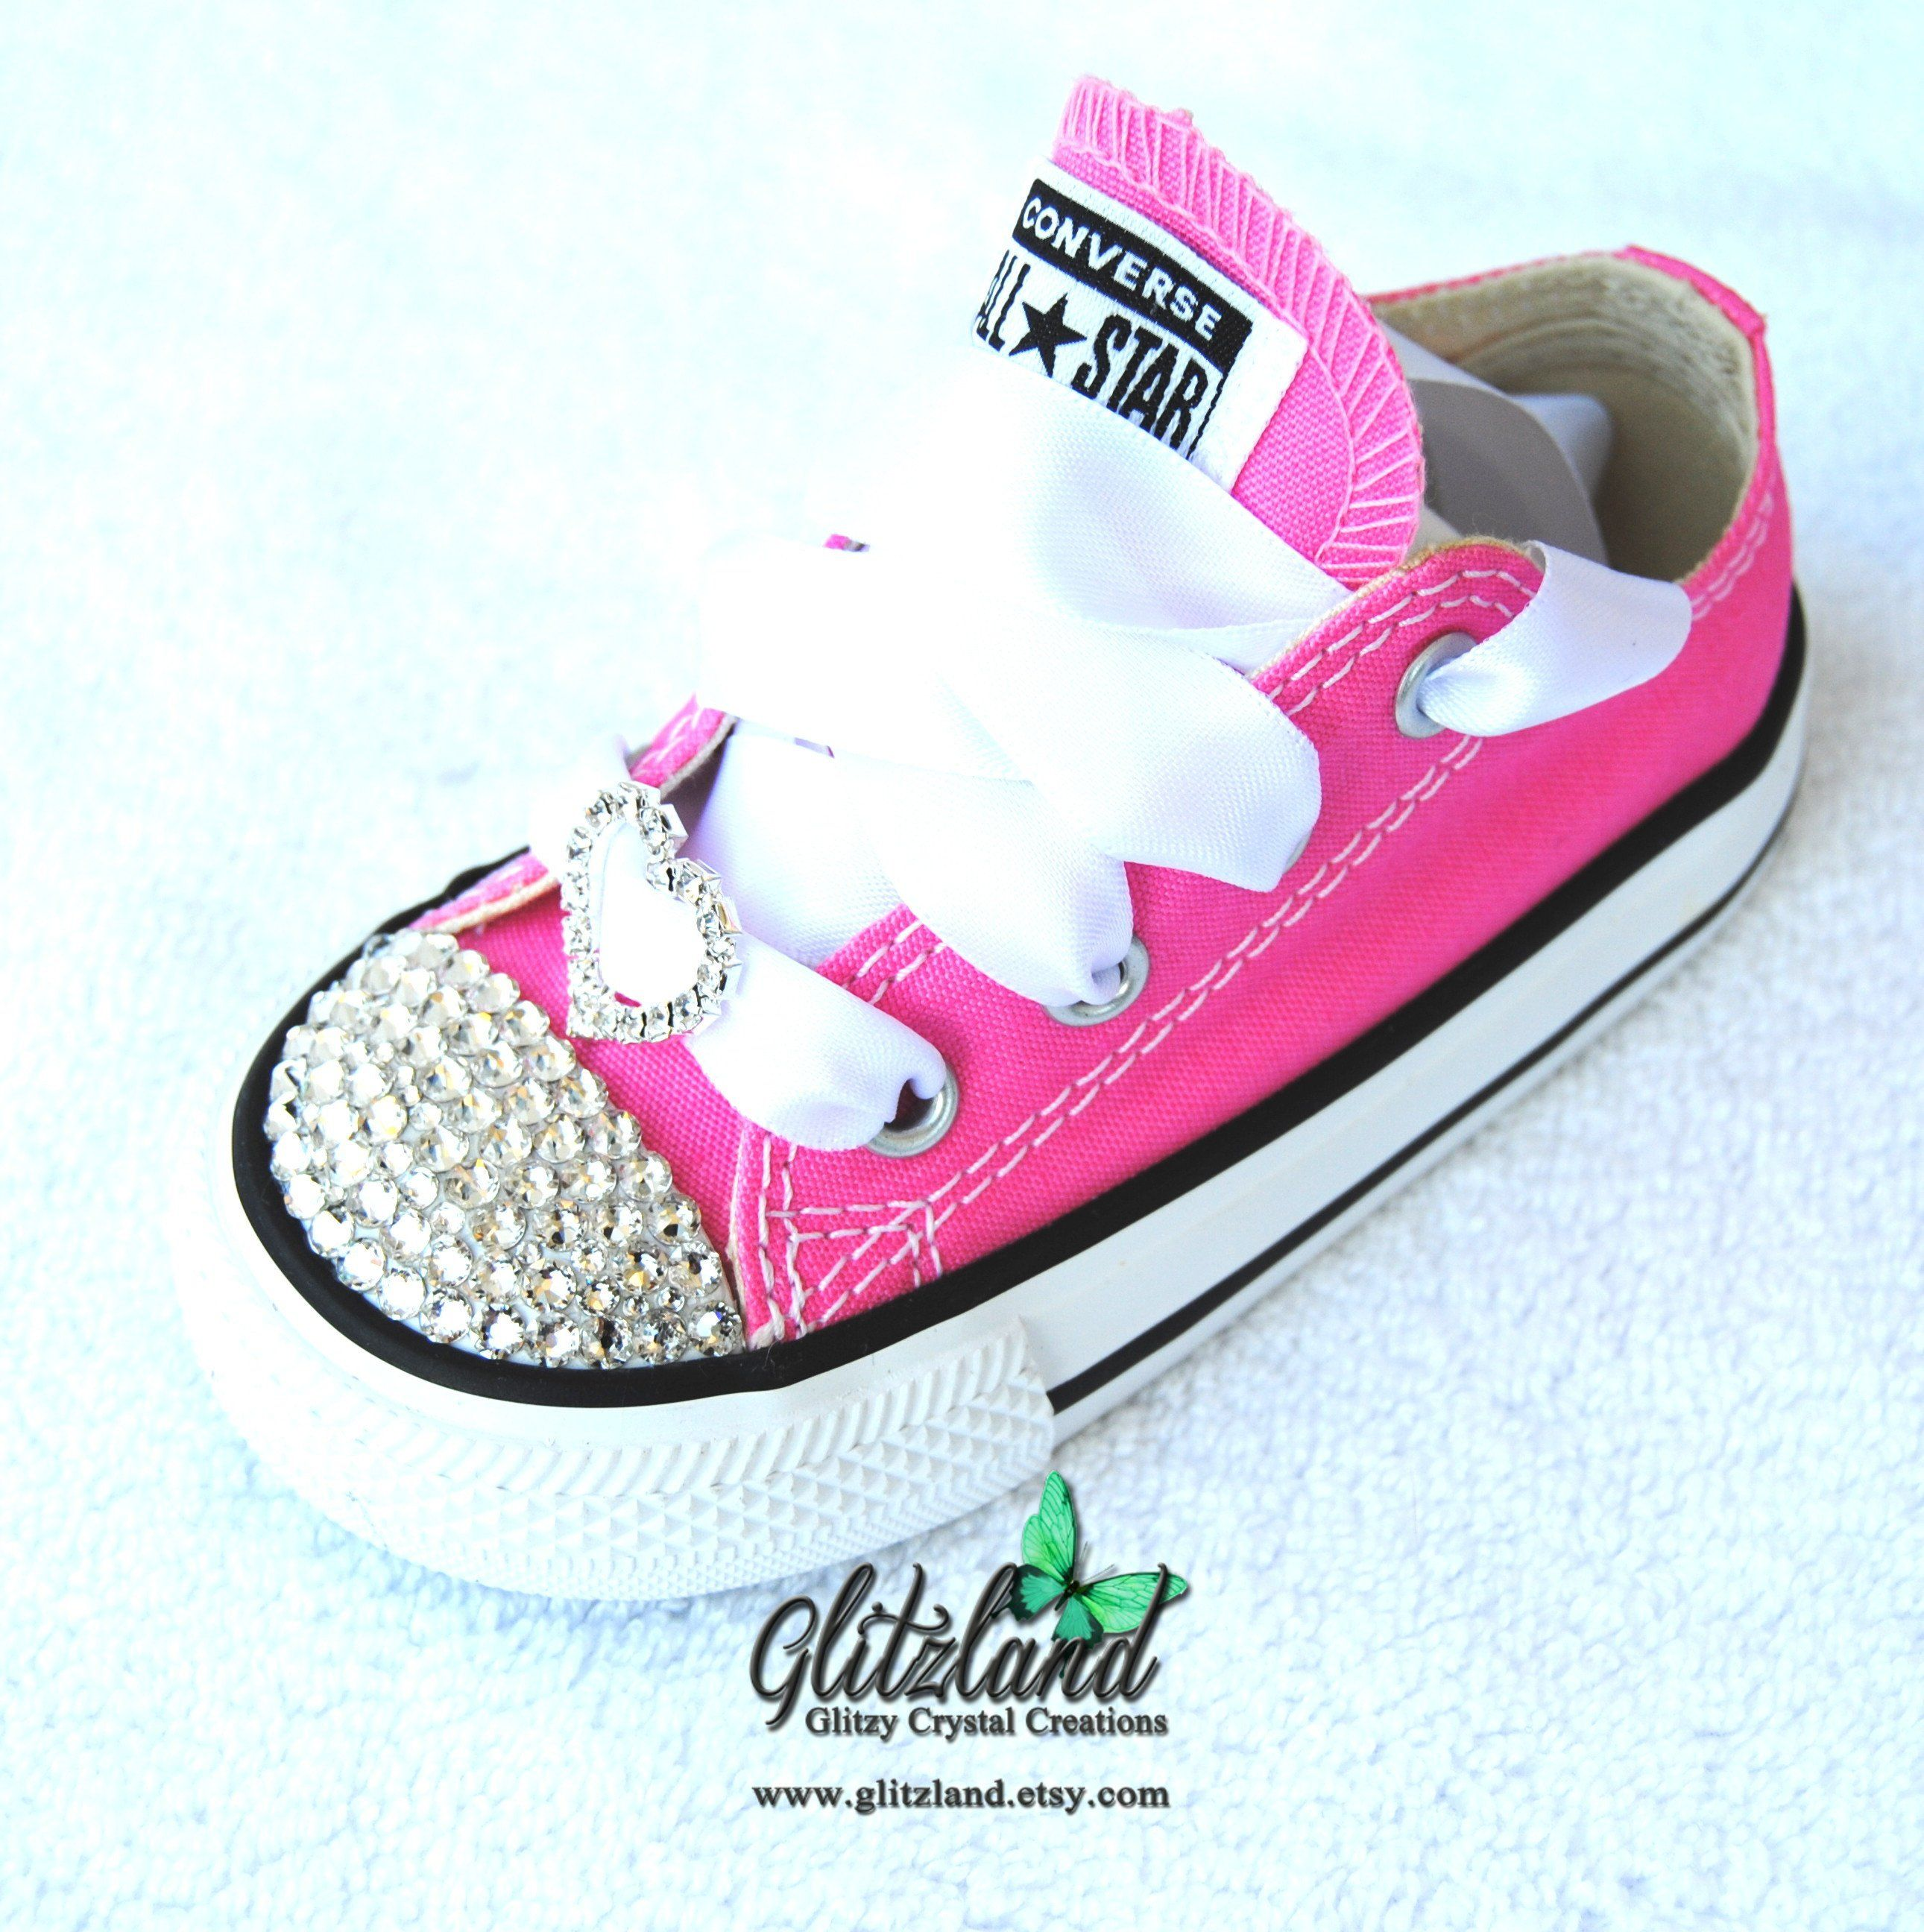 9645d23e9368 New At Glitzland  SWAROVSKI® Converse Toddler Chuck Taylor Canvas Sneakers  Customized With Clear SWAROVSKI